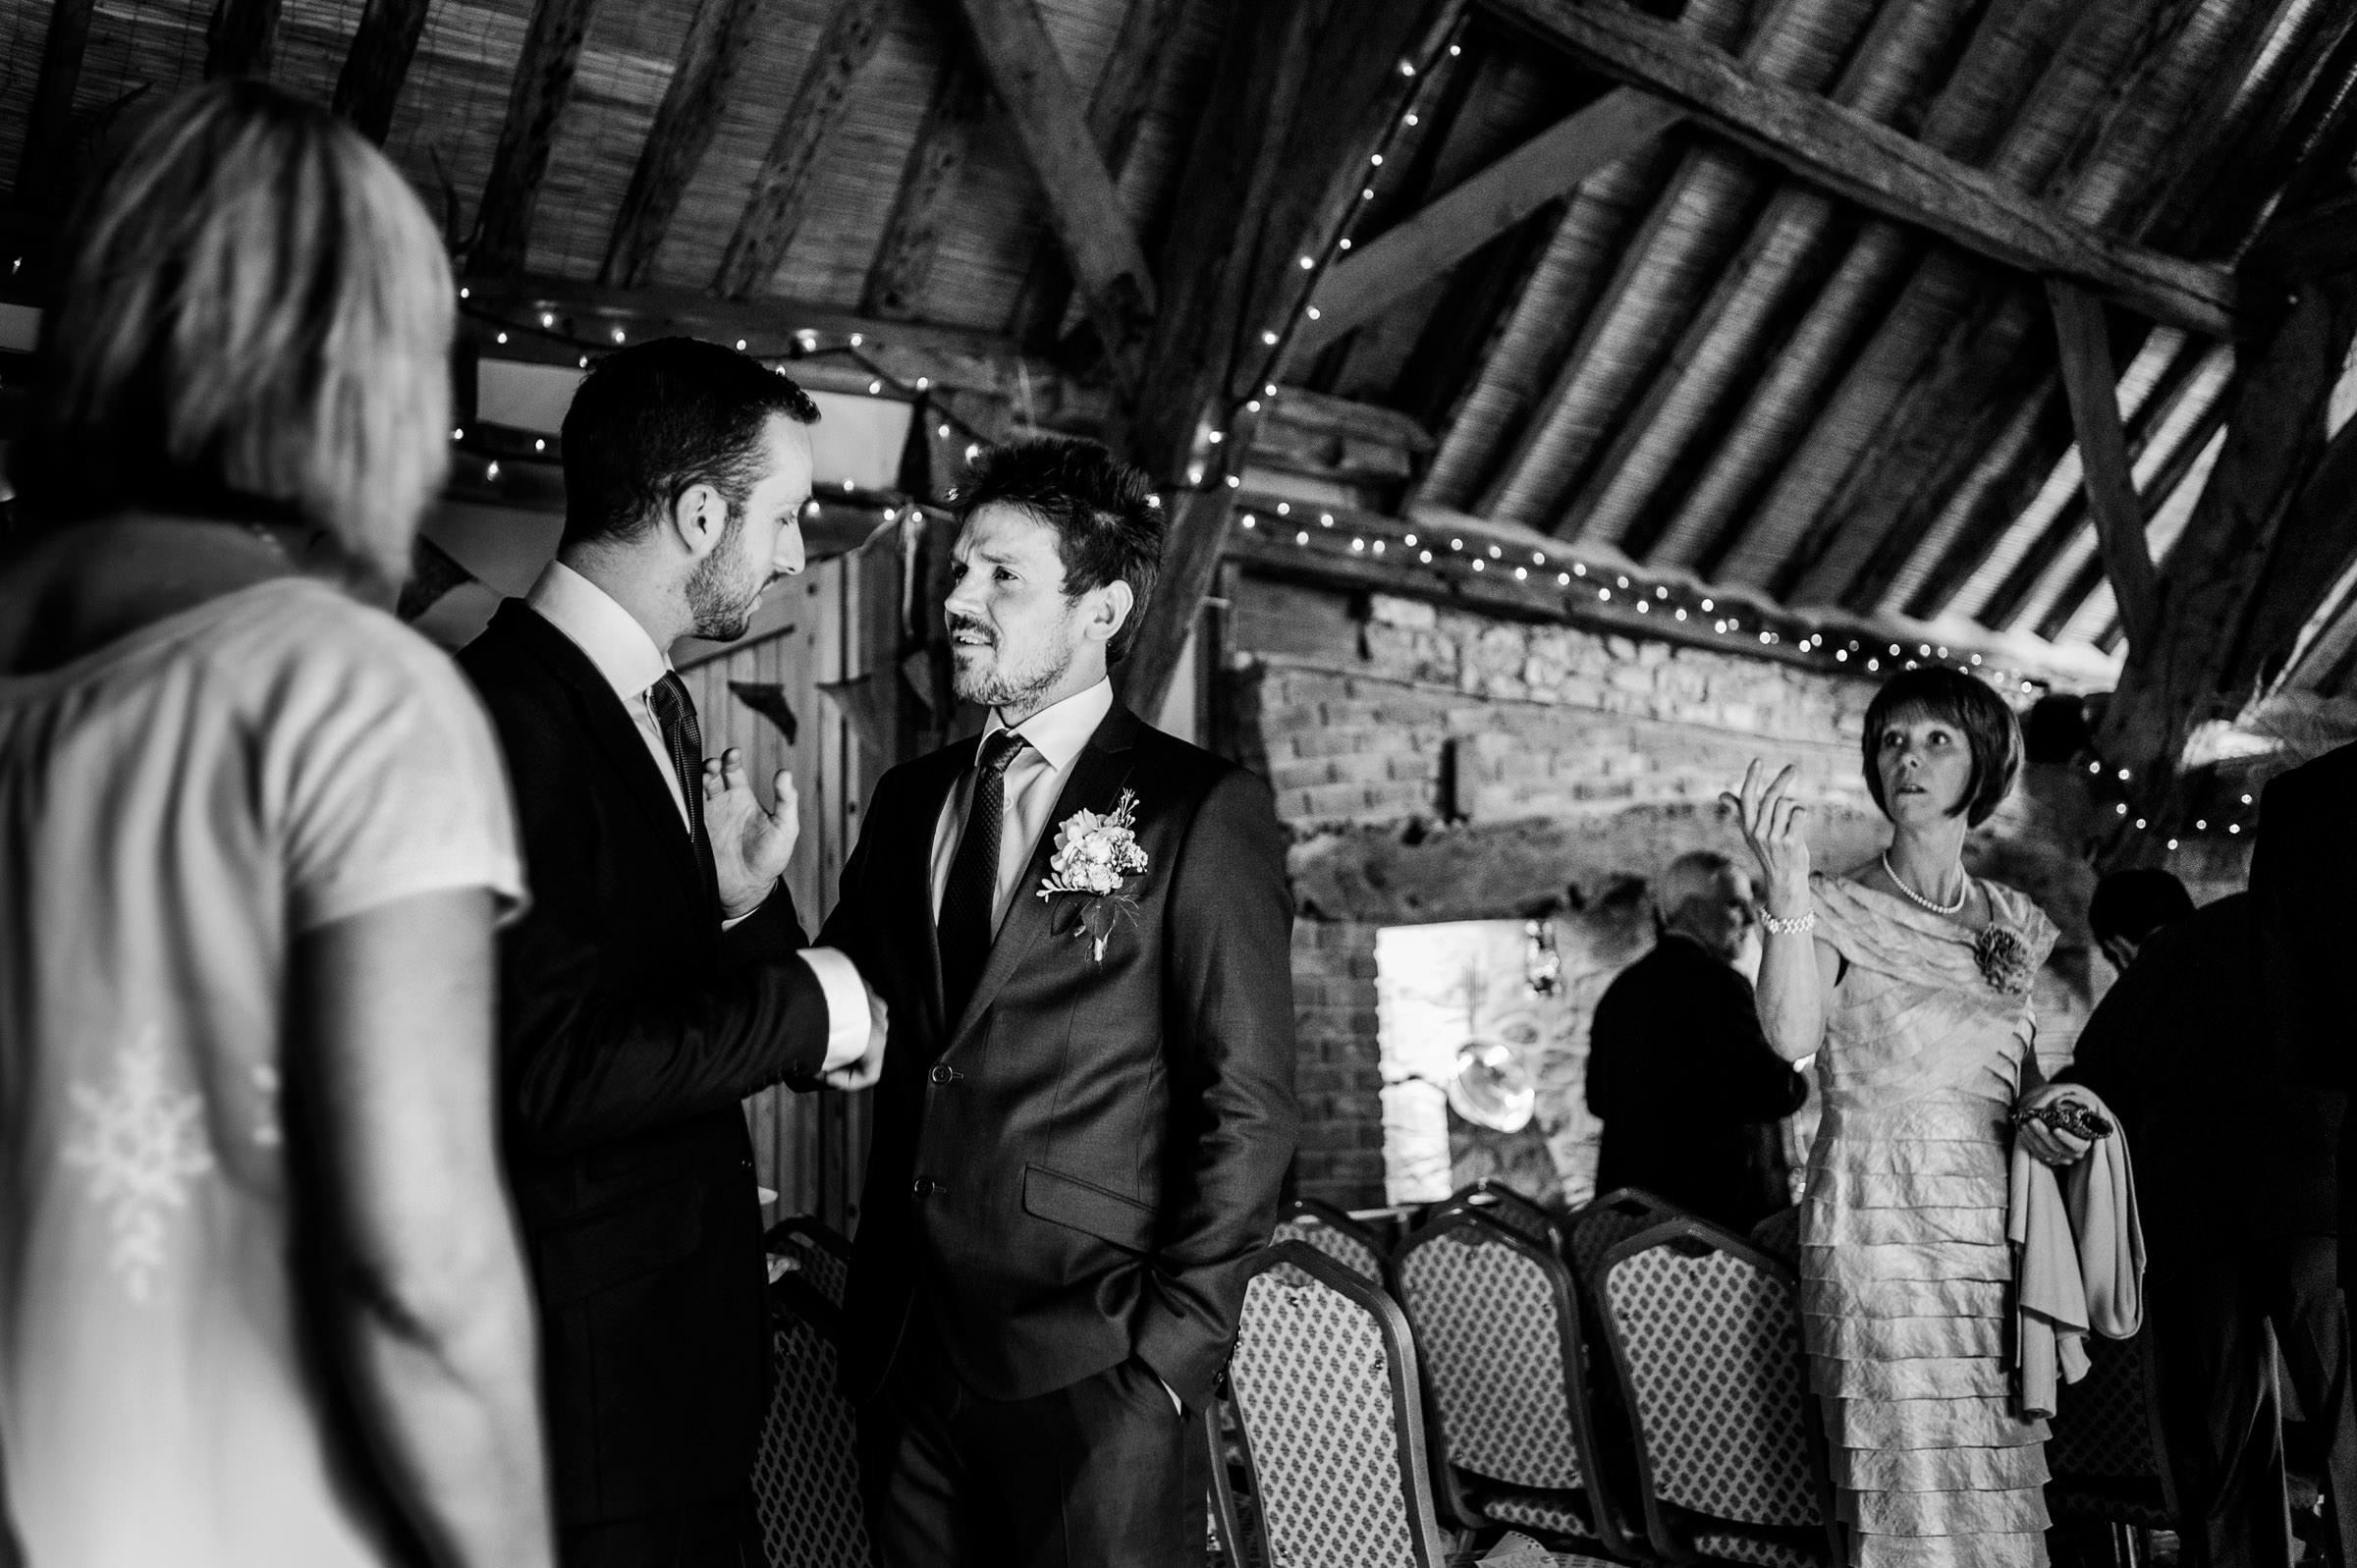 Notley Tythe Barn Reportage Wedding Photos 009.jpg